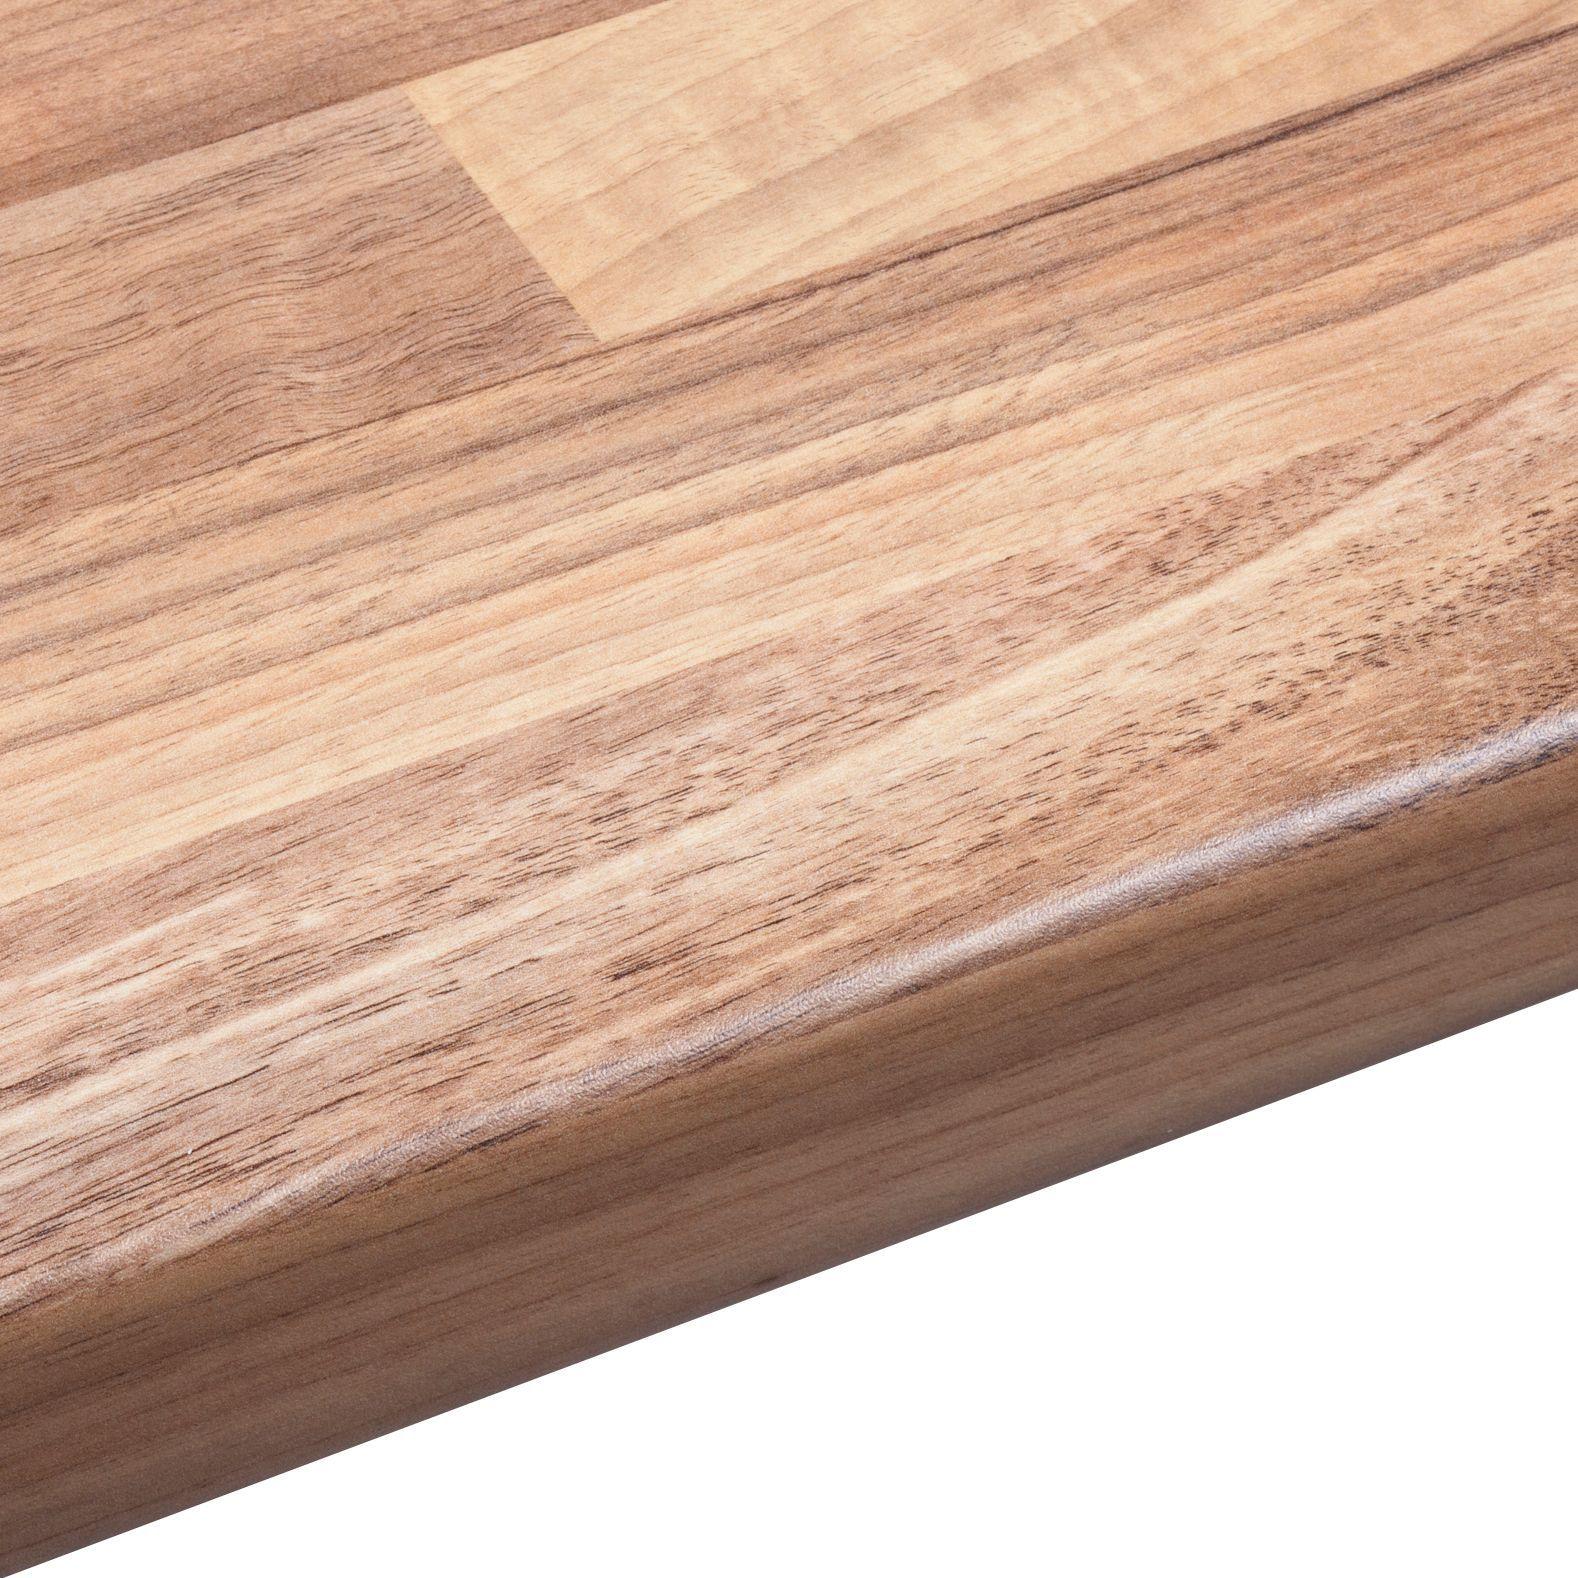 38mm Oak Wood Mix Laminate Wood Effect Round Edge Worktop (L)3000mm  (D)600mm | Departments | DIY At Bu0026Q.